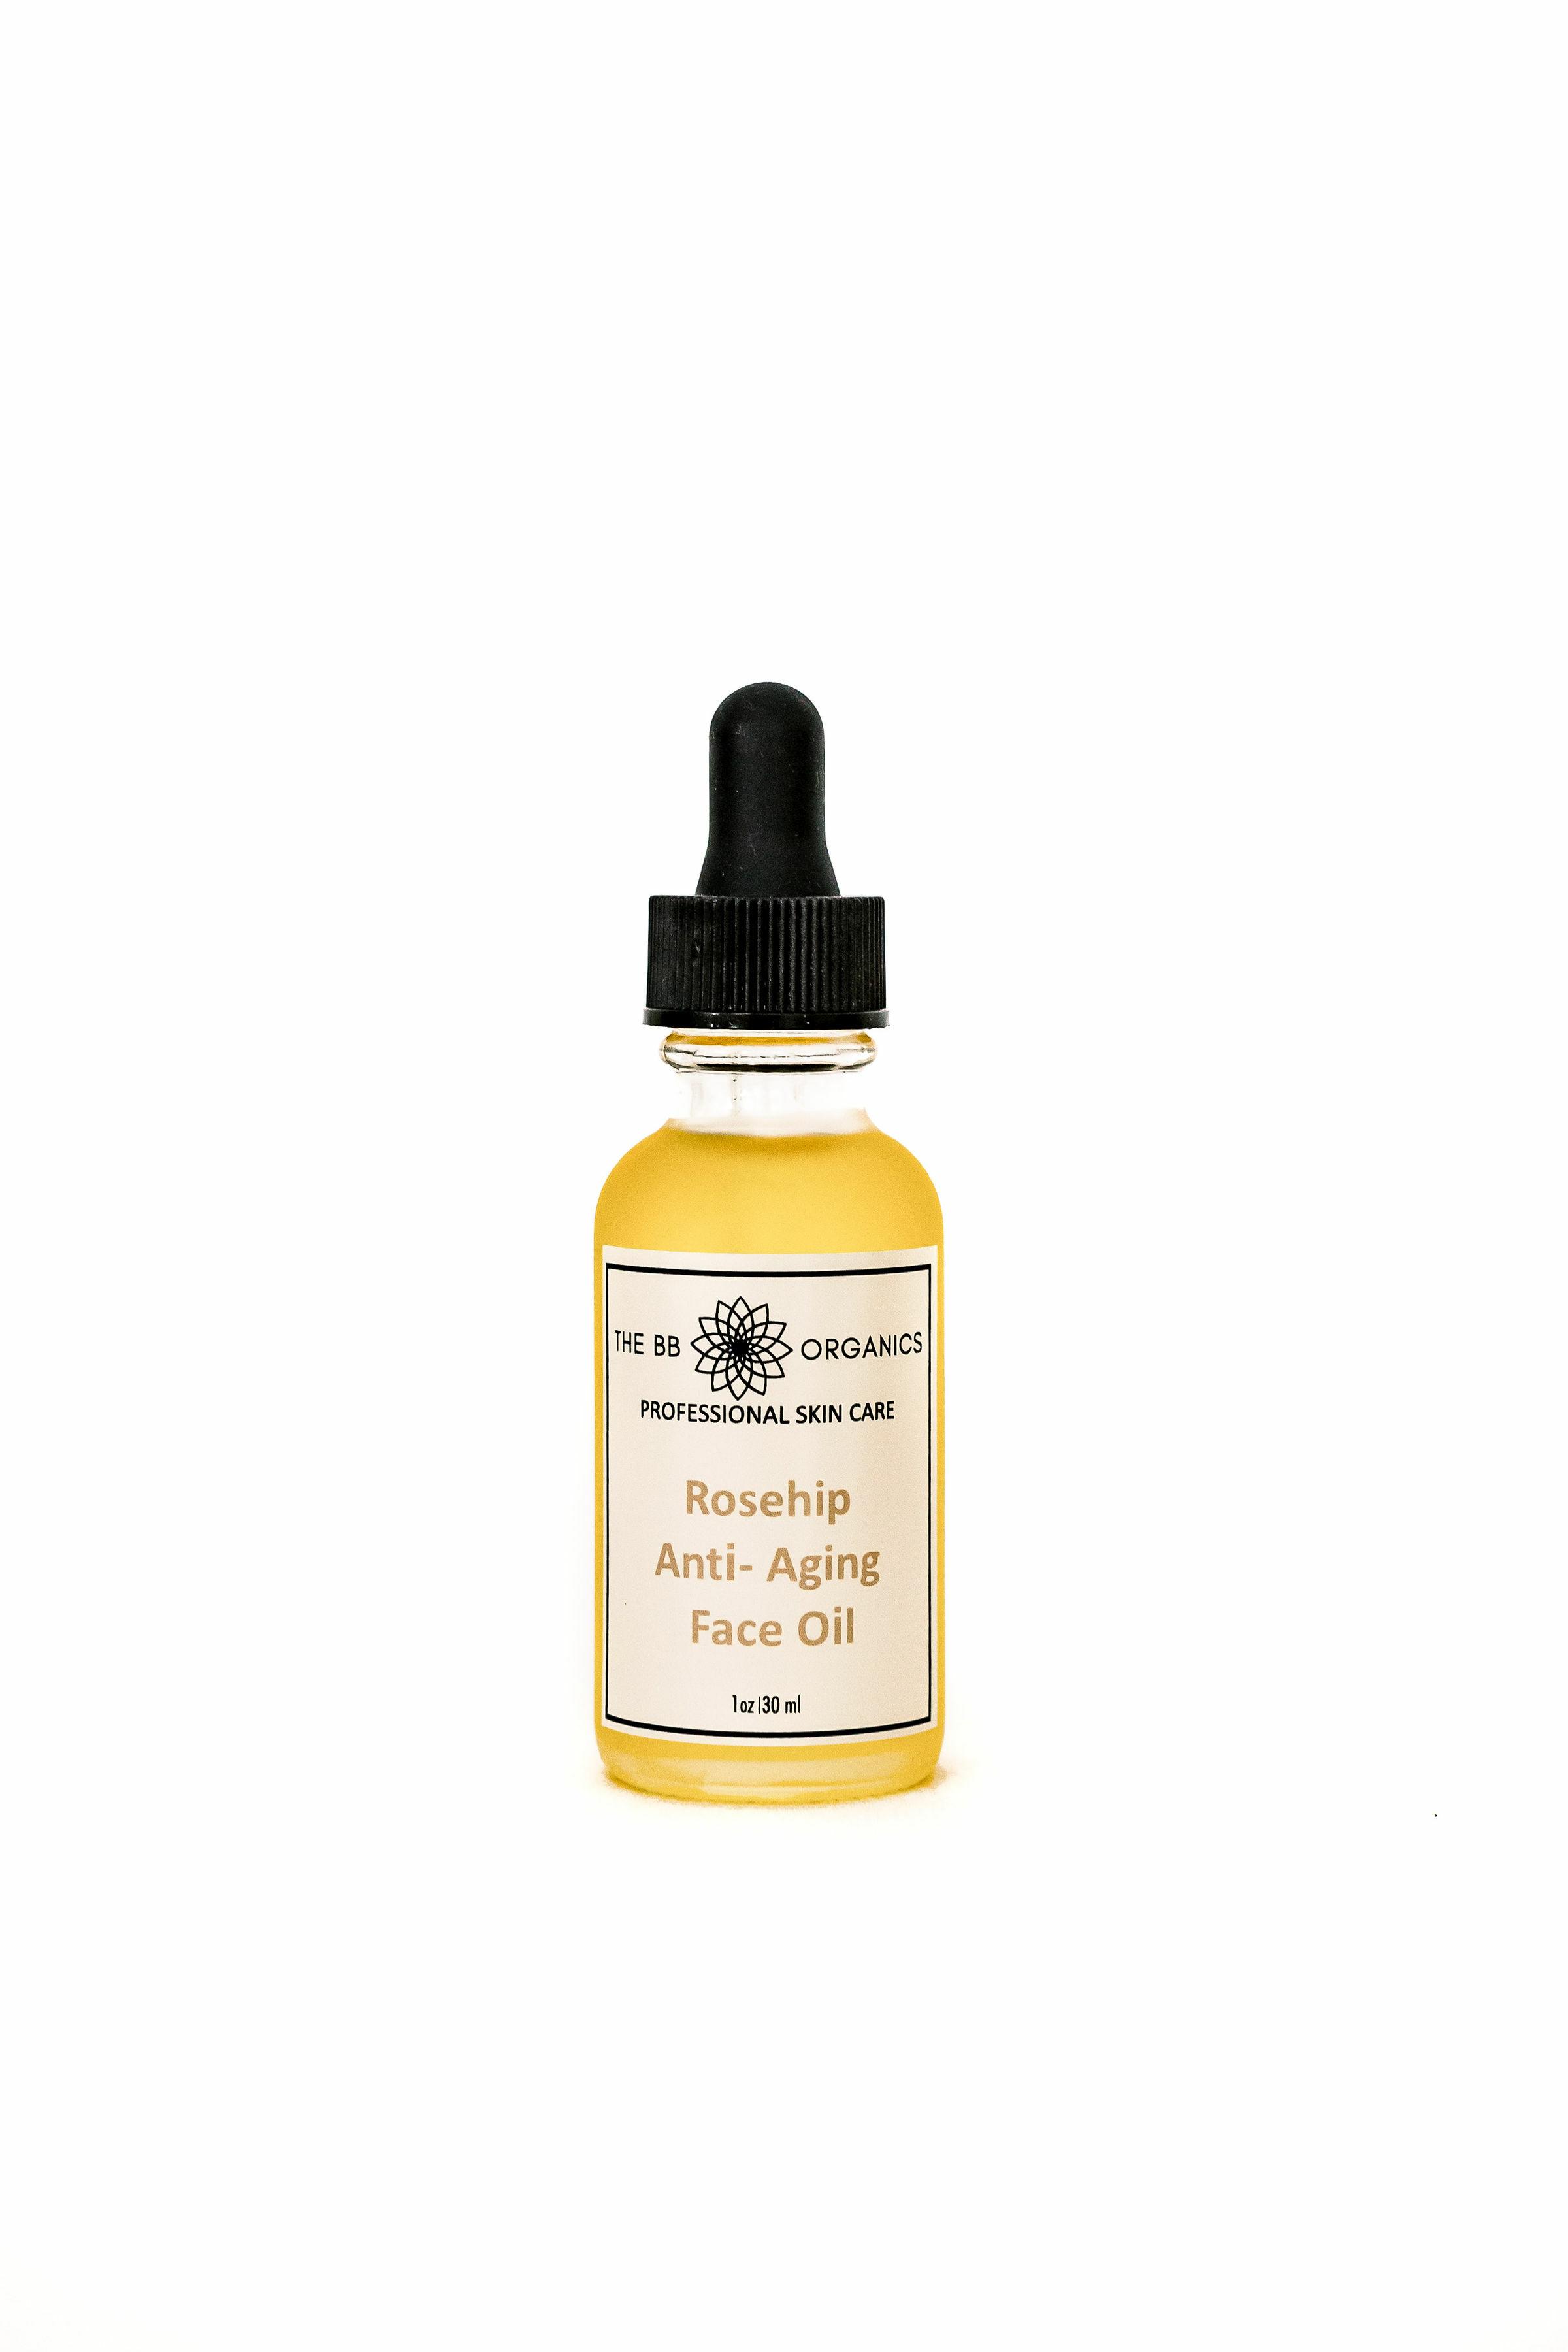 Rosehip Anti-Aging Face Oil 00020